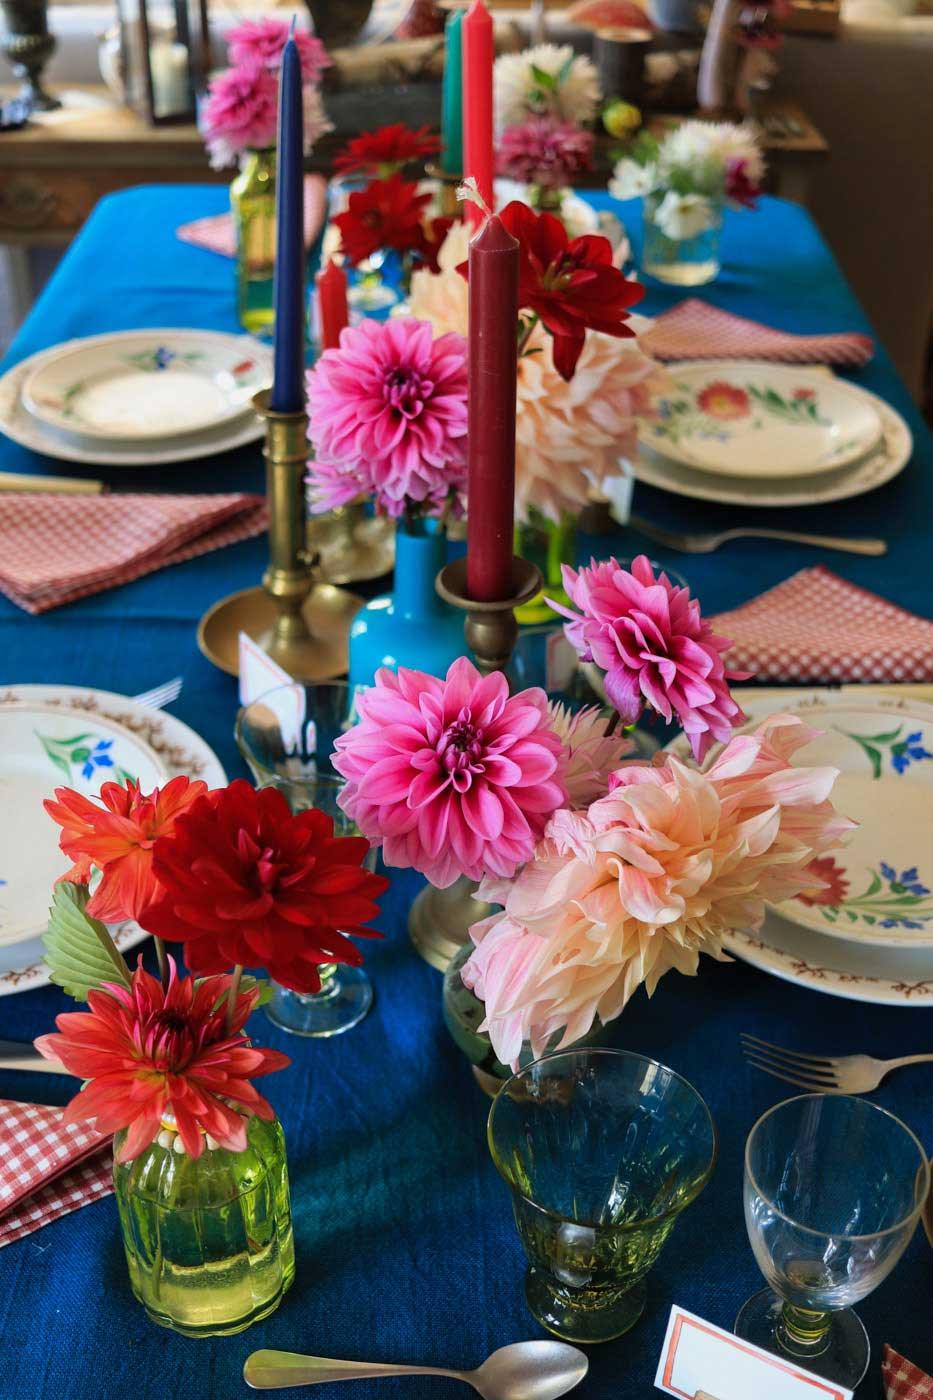 dresser-table-art-dahlias-tablescape-how-to-set-table-vt-06